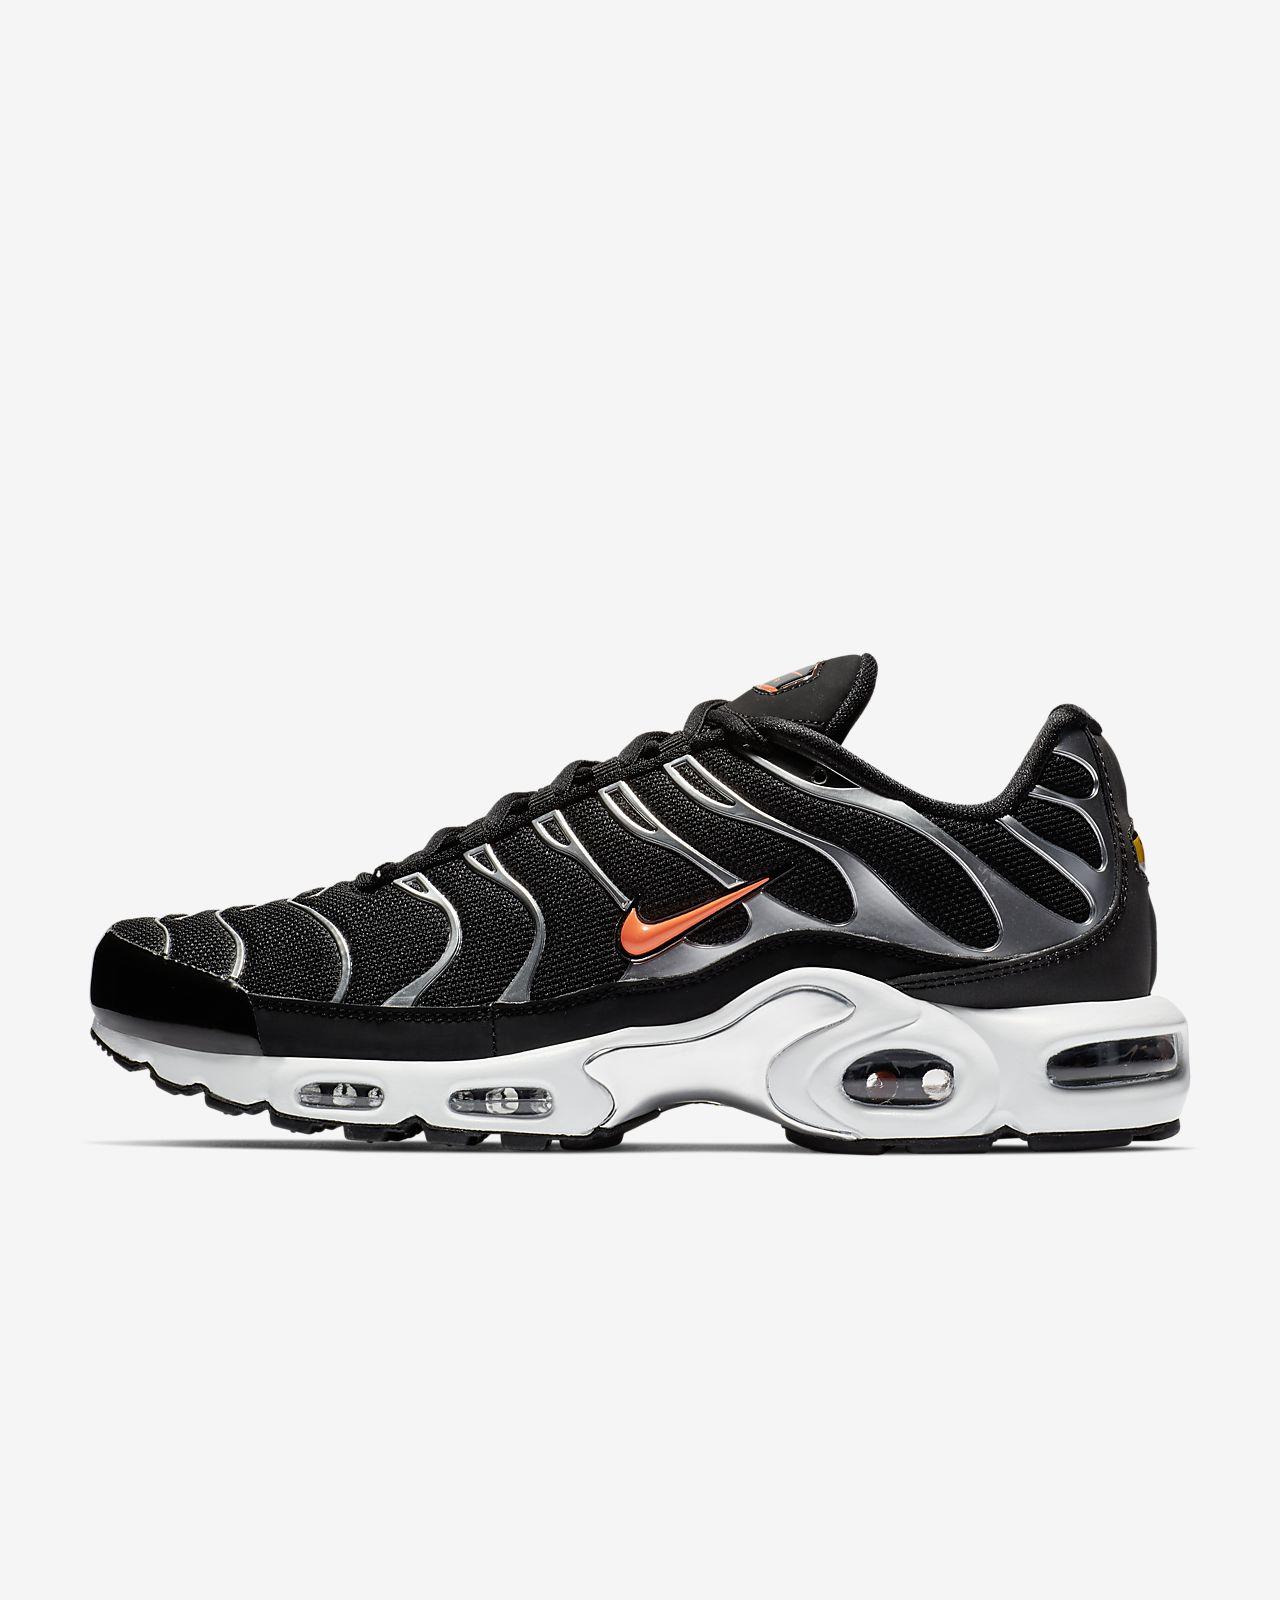 save off c6001 35afd ... Nike Air Max Plus TN SE sko til herre